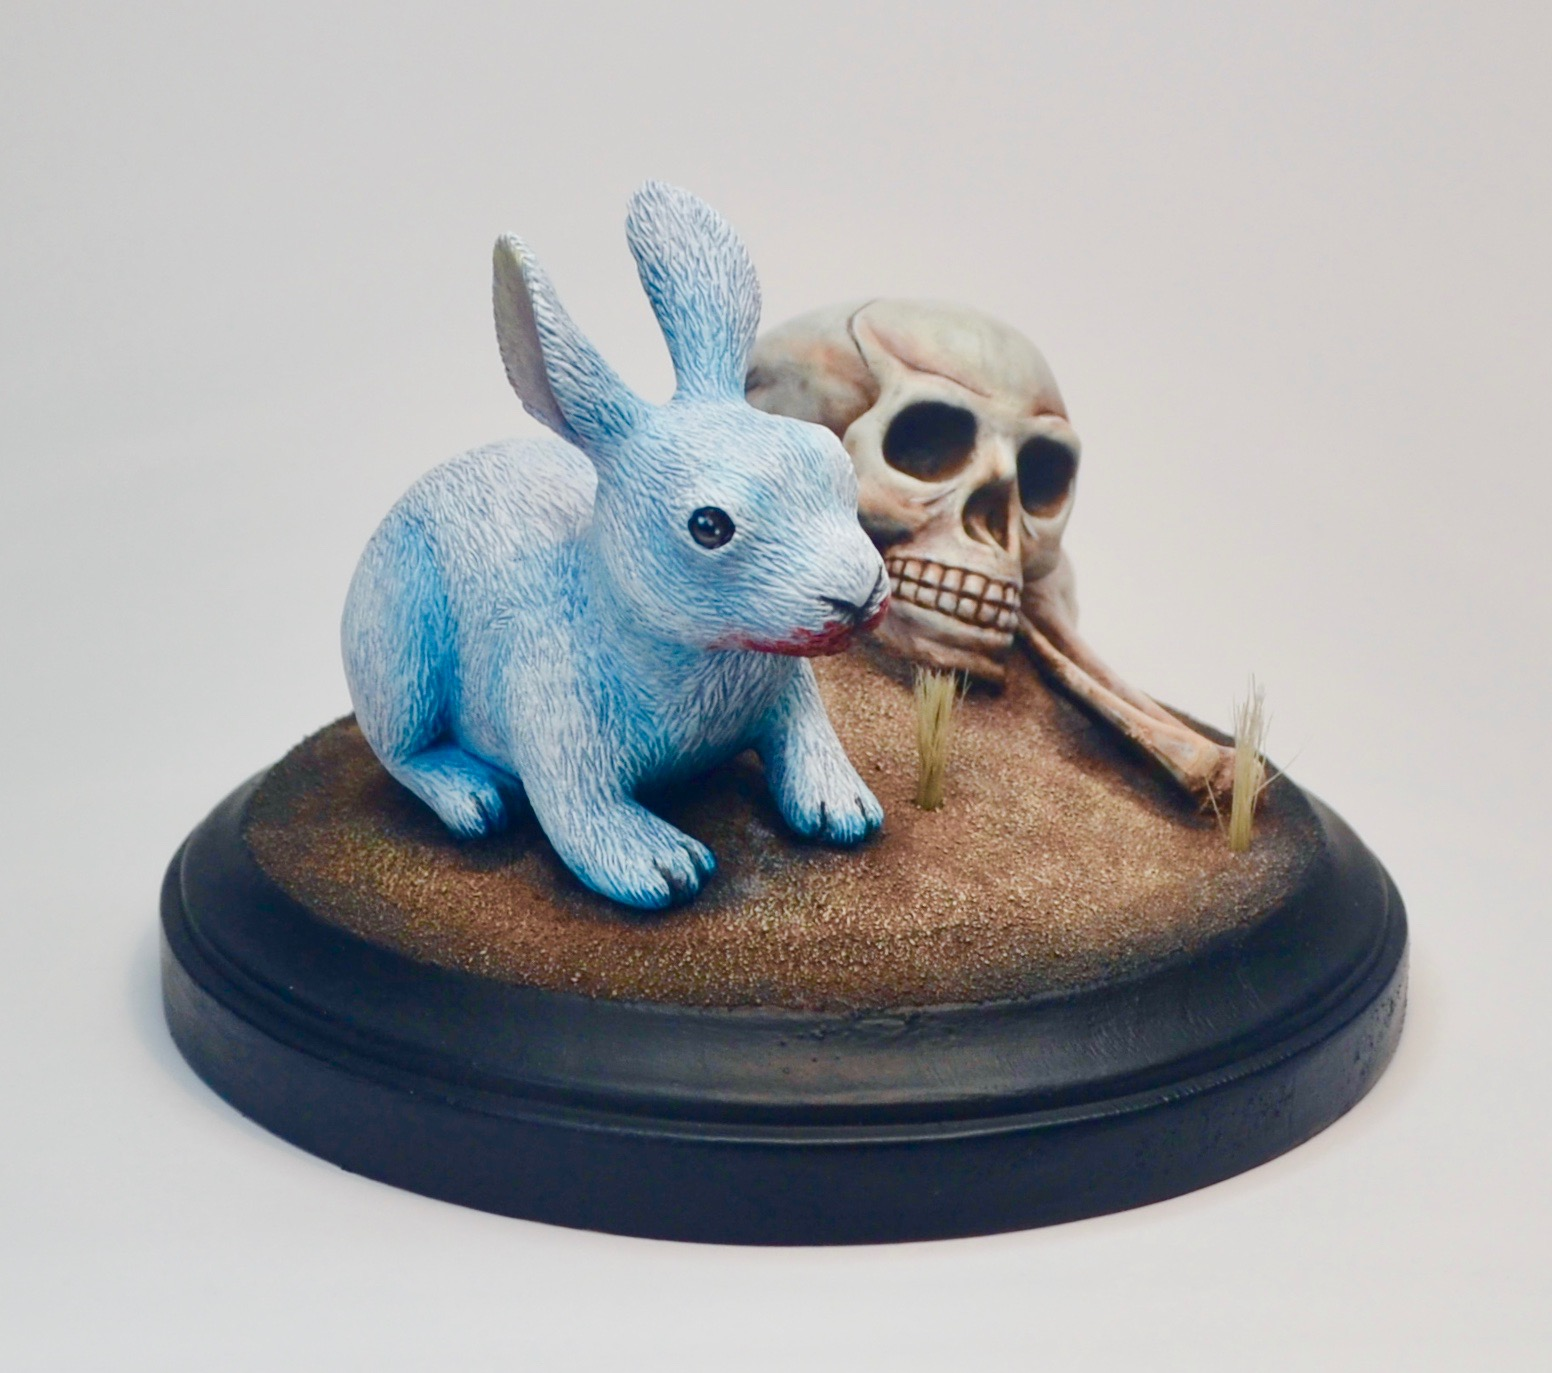 Killer Rabbit of Caerbannog